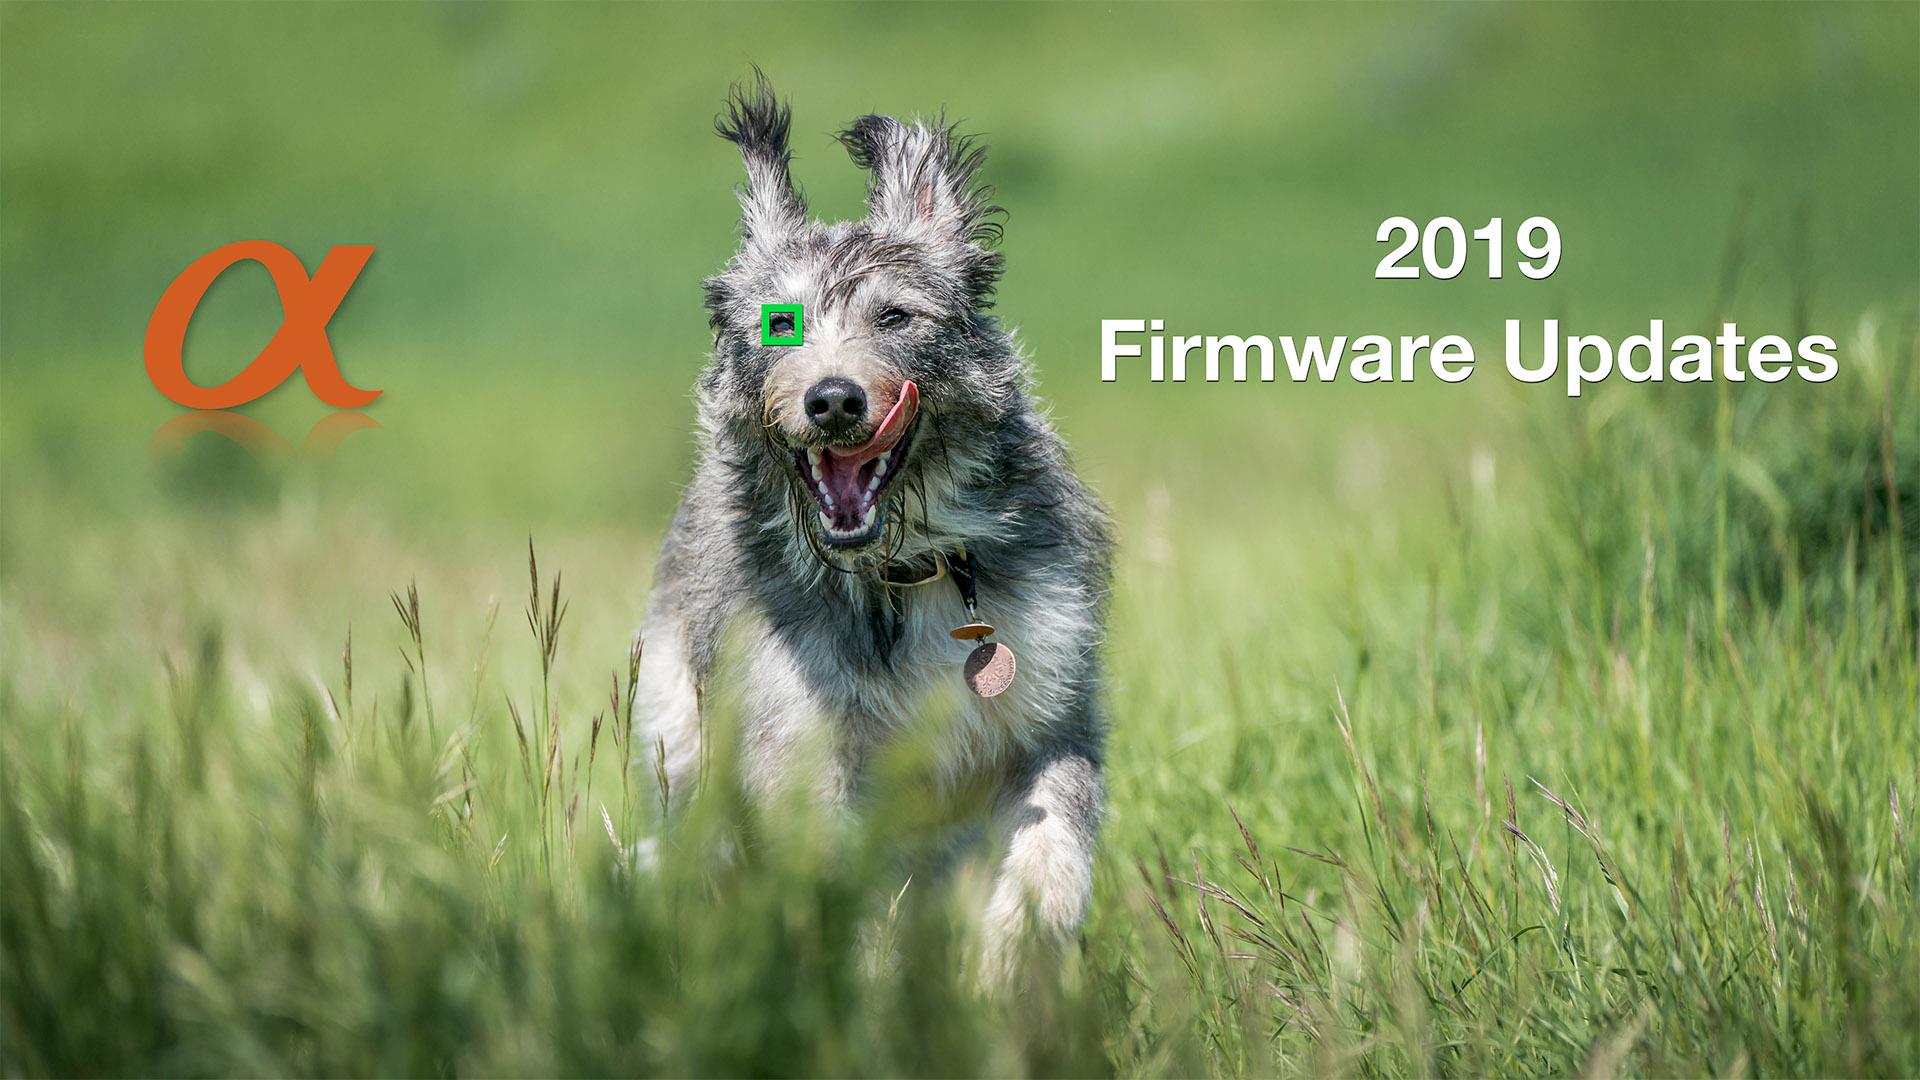 Sony Alpha 2019 Firmware Updates - Mark Galer